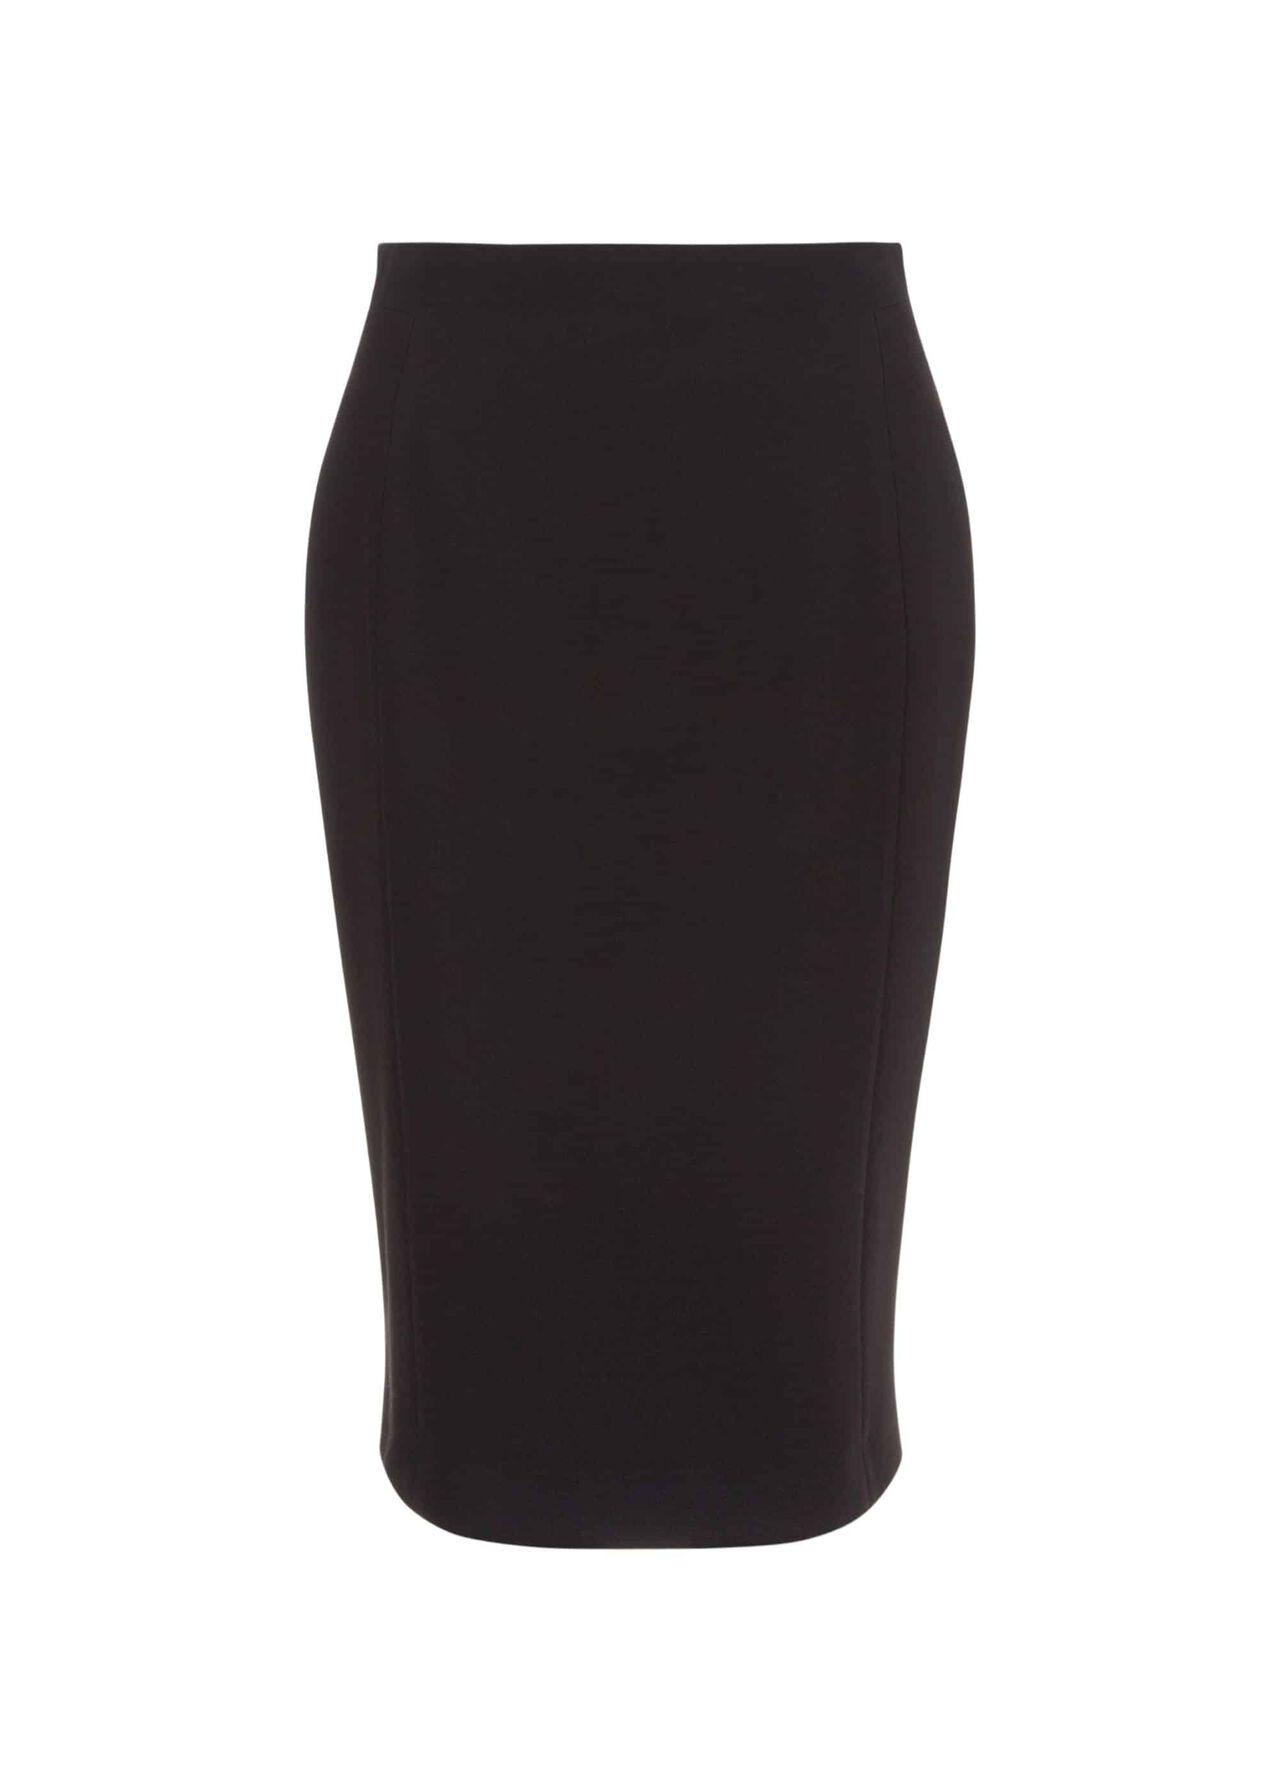 Petite Anne Skirt Black